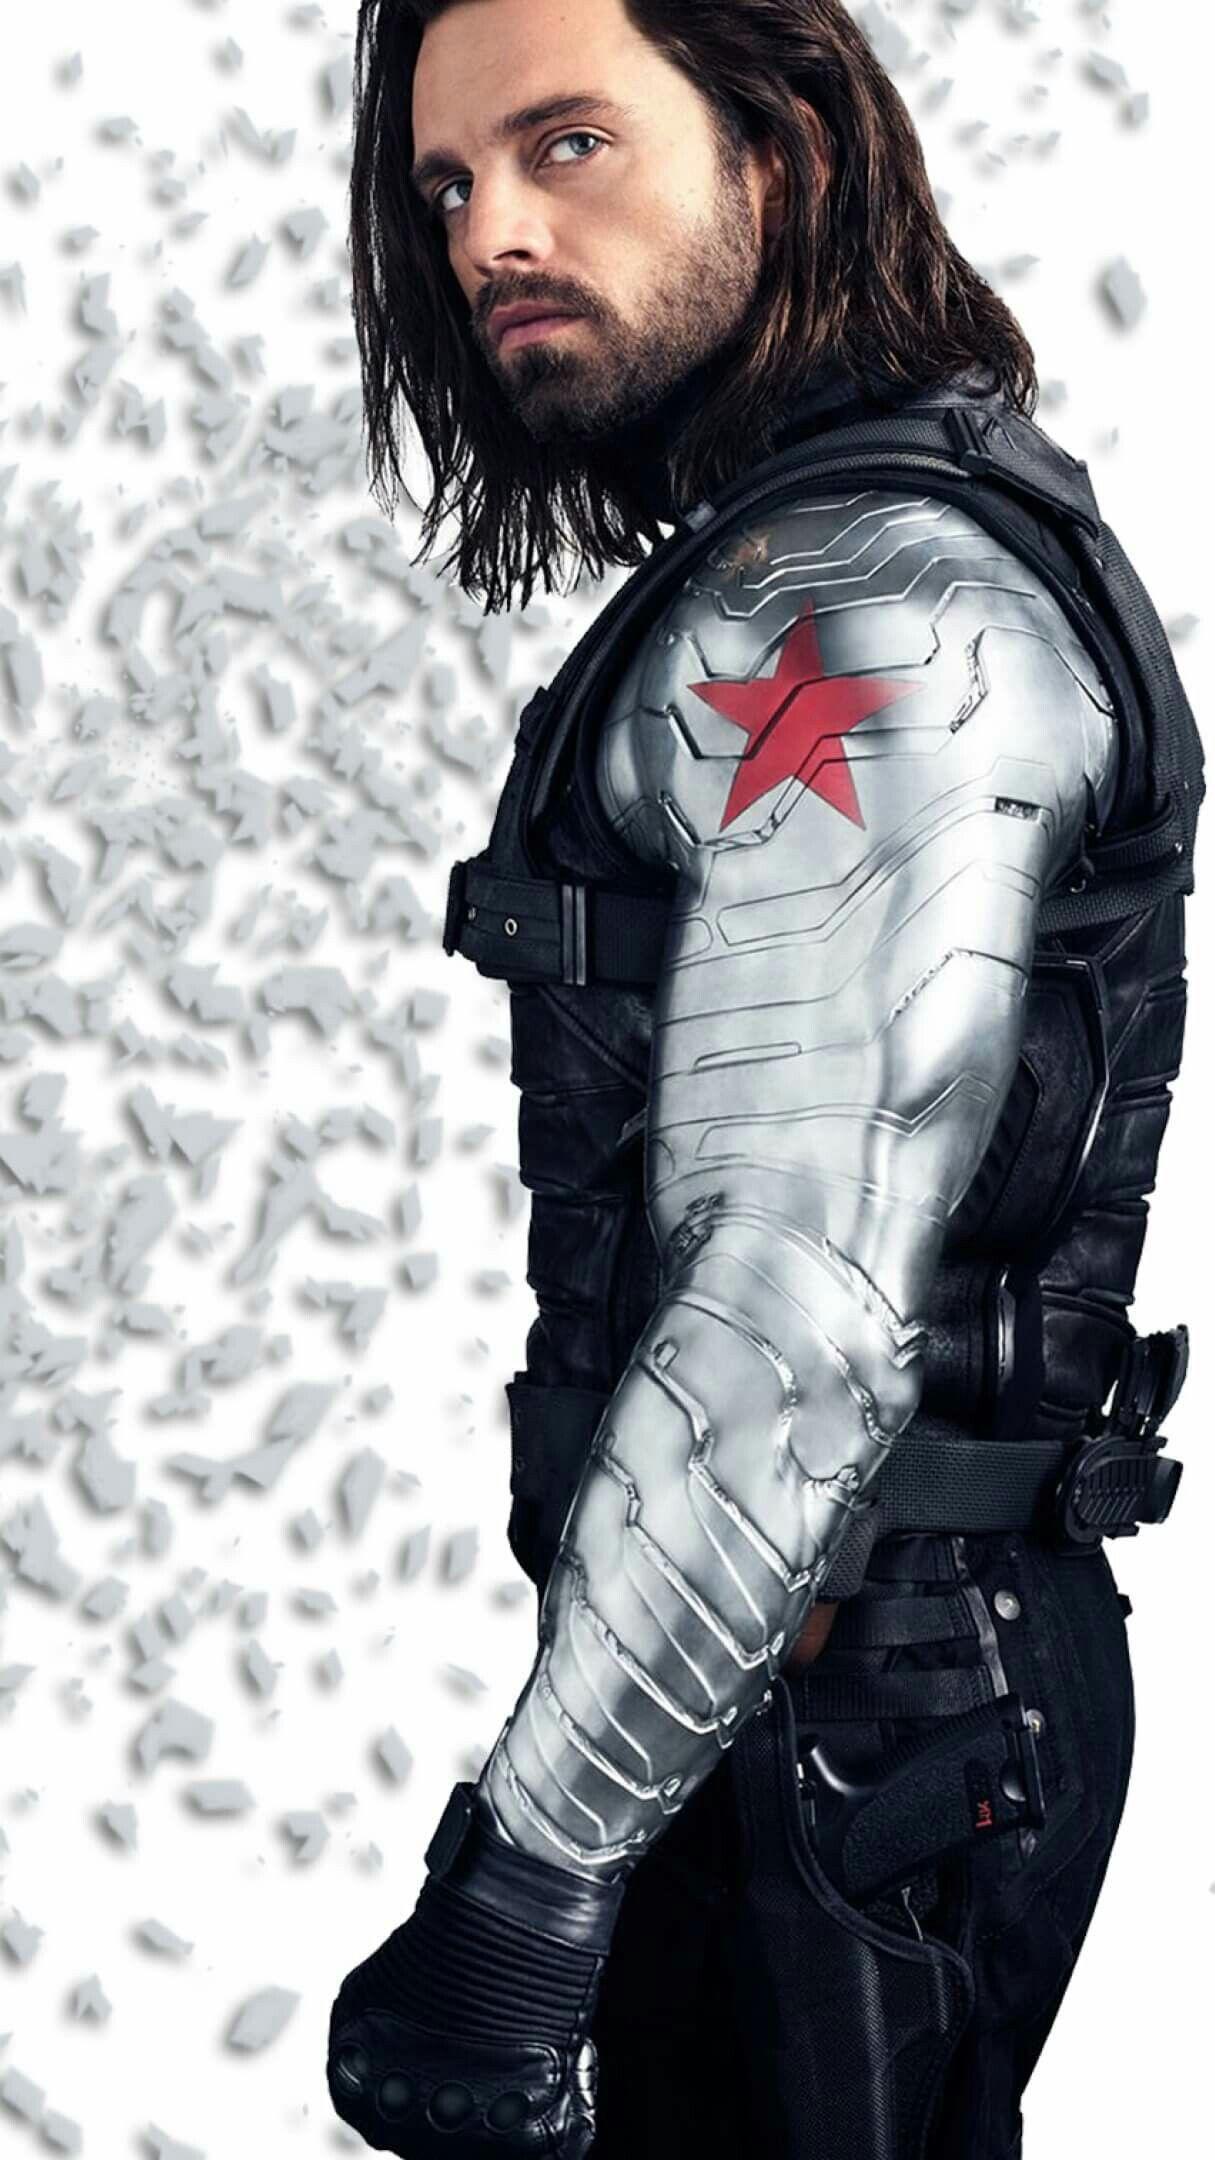 Pin By Bucky Barnes On Marvel Captain America Winter Soldier Bucky Barnes Bucky Barnes Winter Soldier